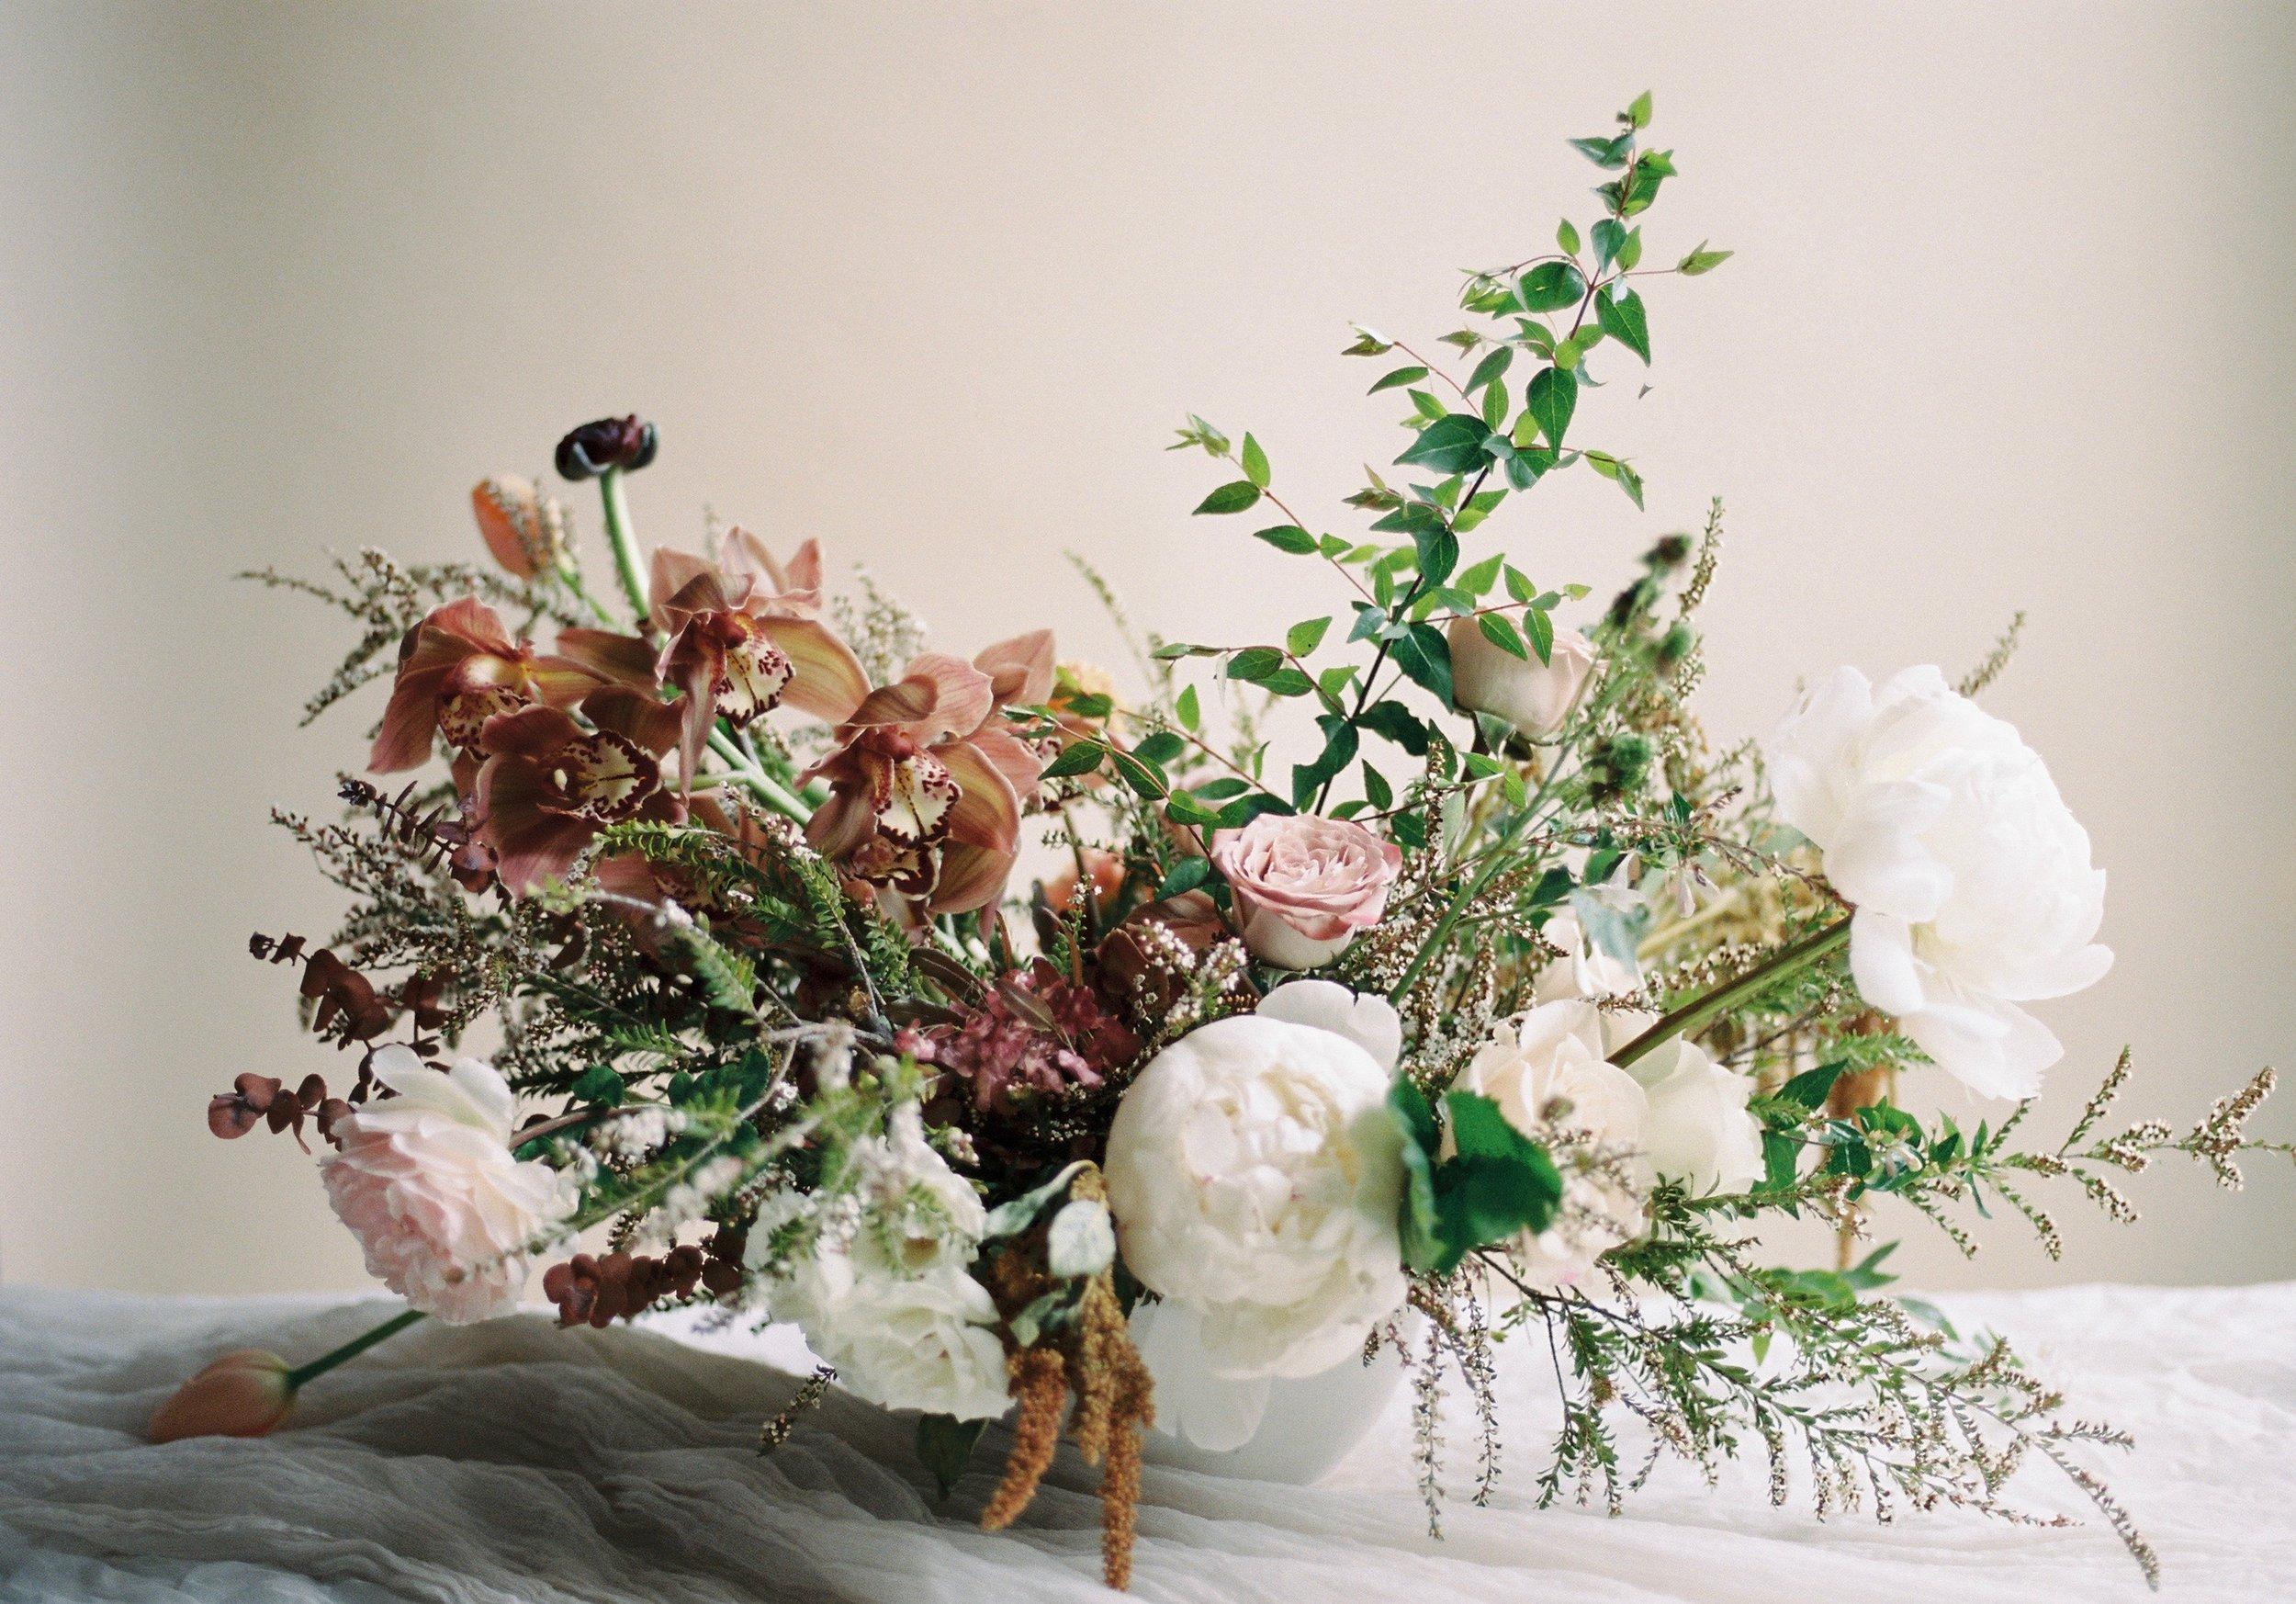 brie_walter_floral_studio